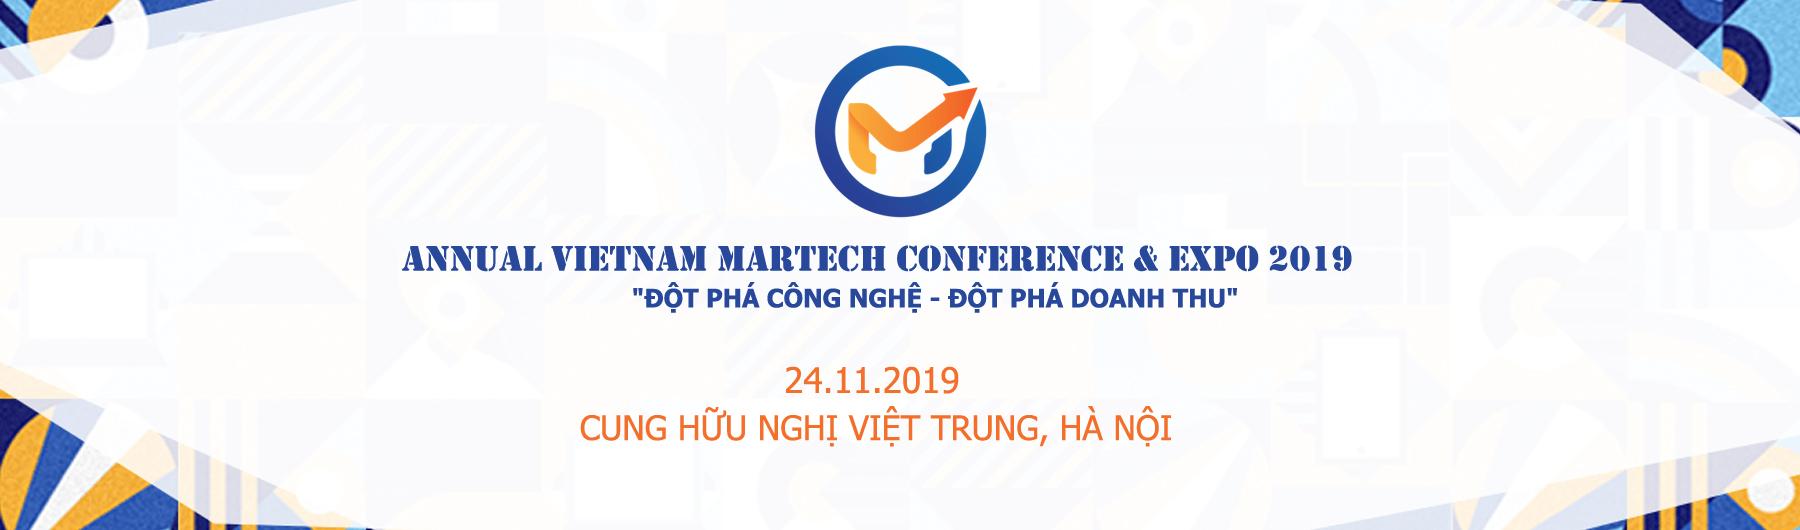 Vietnam MarTech Conference & Expo 2019